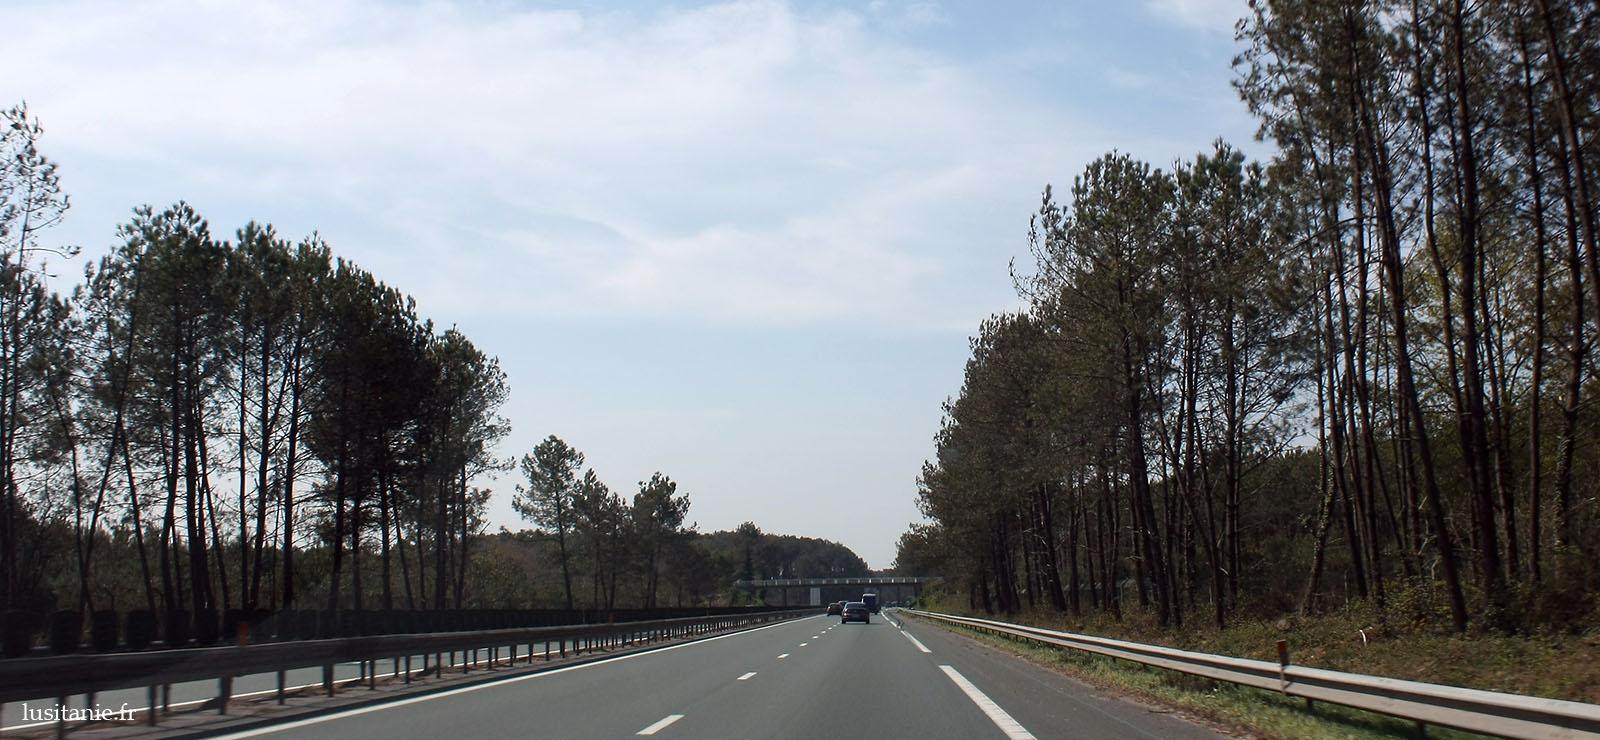 voyages en voiture